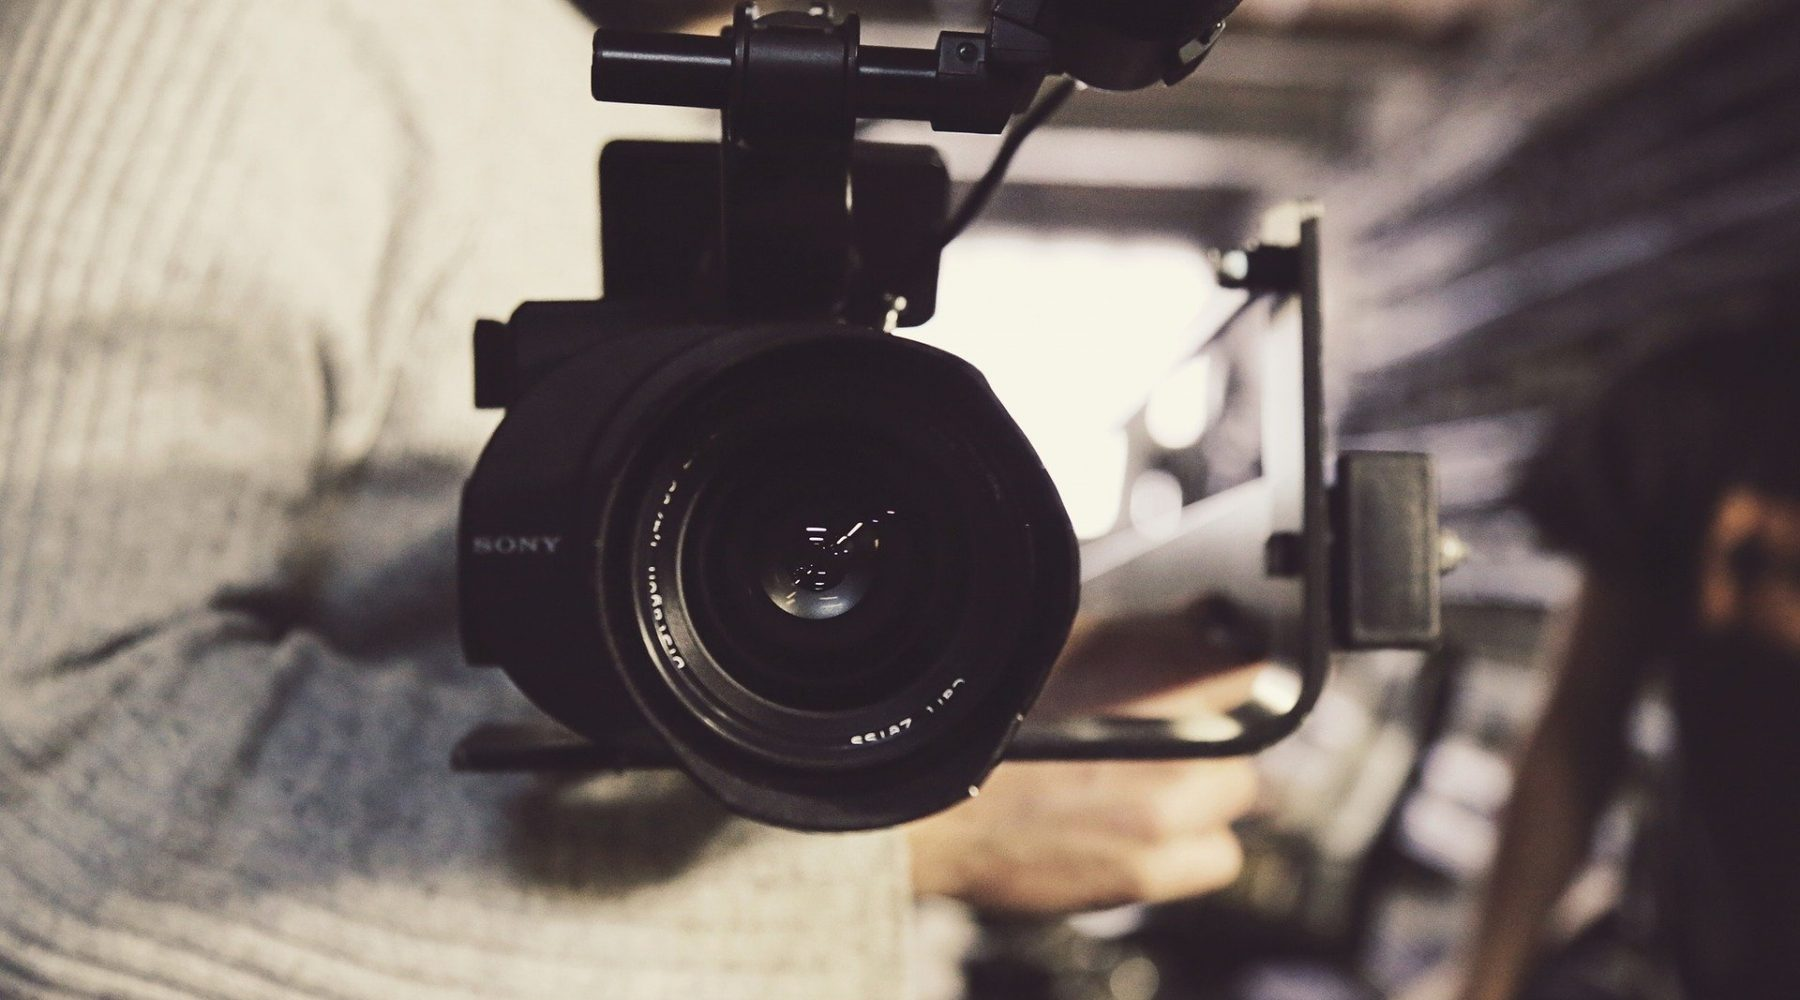 camera-690163_1920